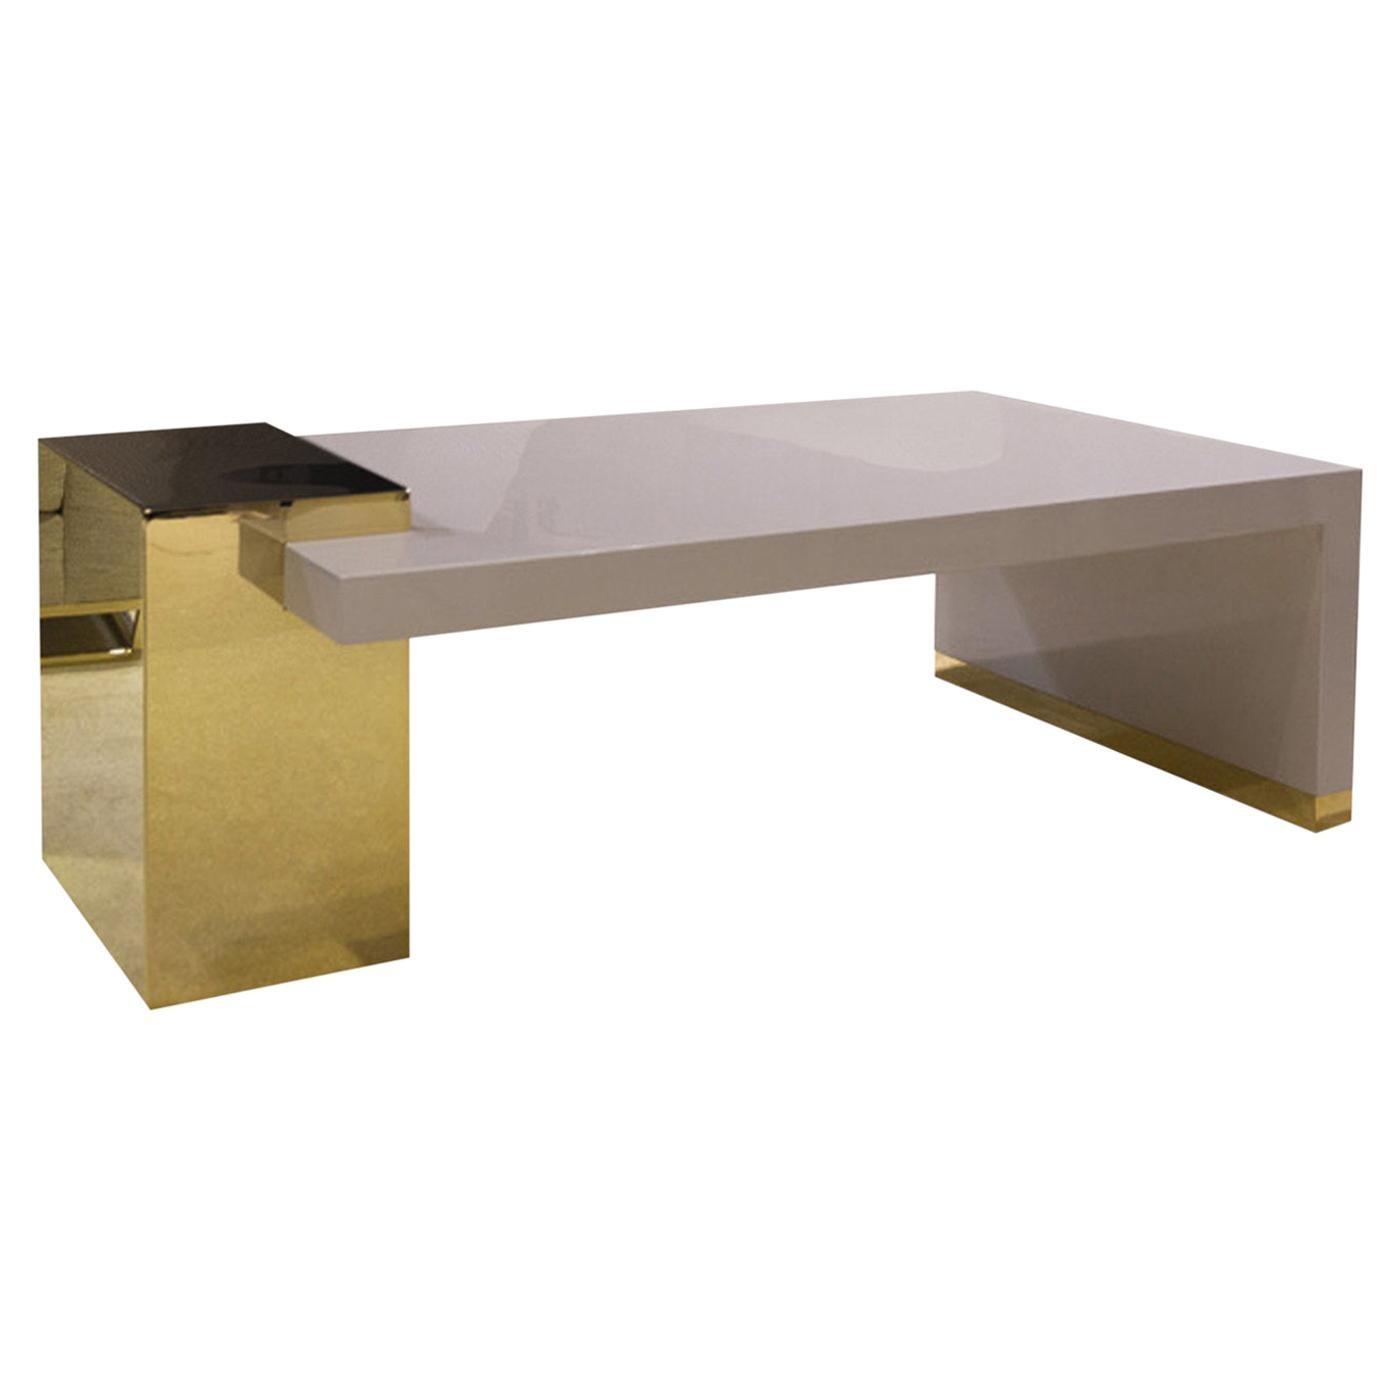 Hopper Coffee Table by Giannella Ventura